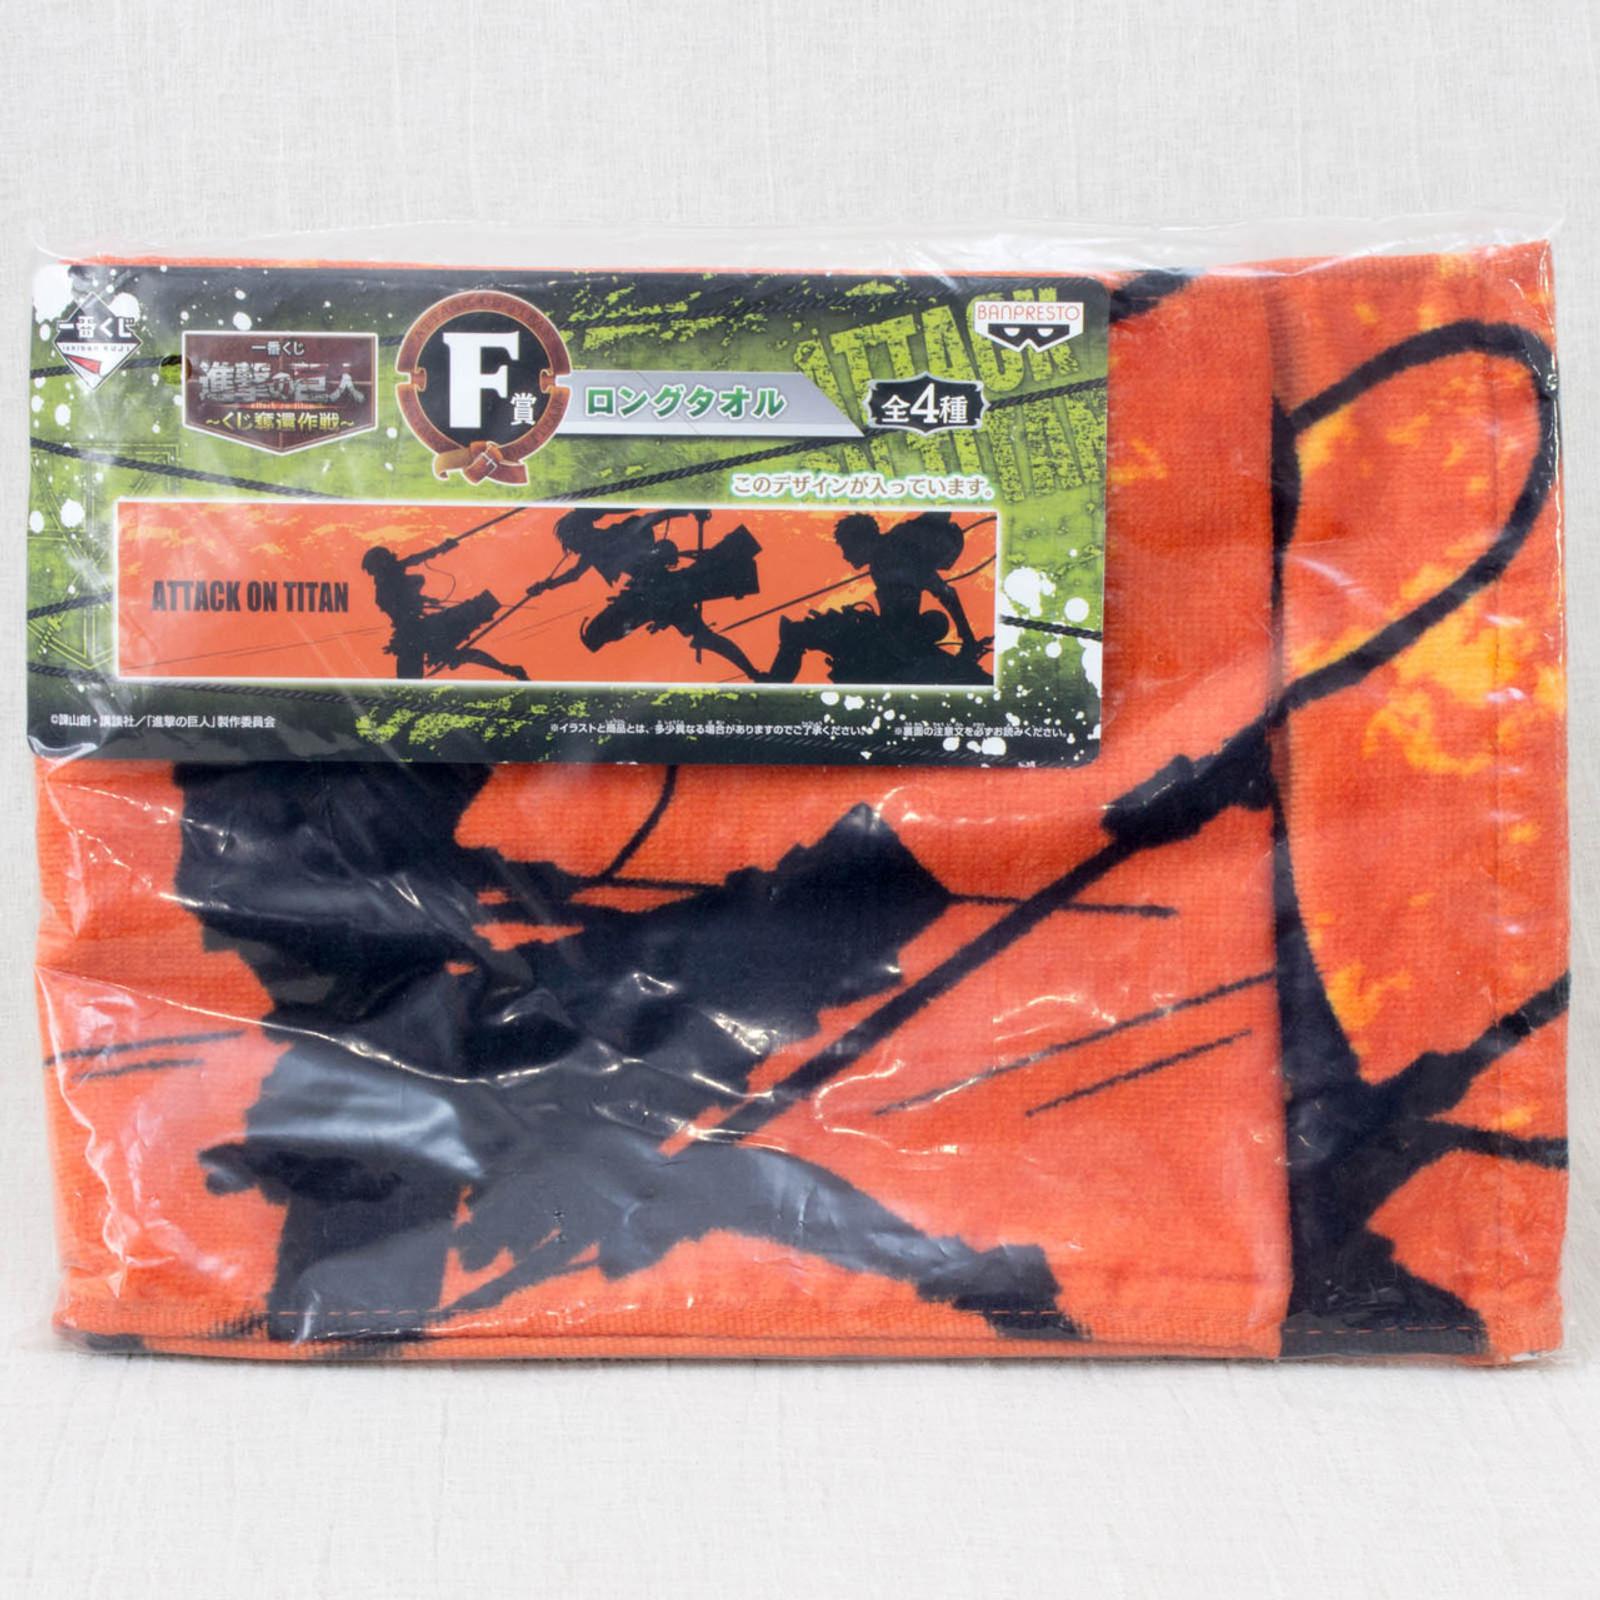 Attack on Titan Long Towel 40 inch Orange Banpresto JAPAN ANIME MANGA